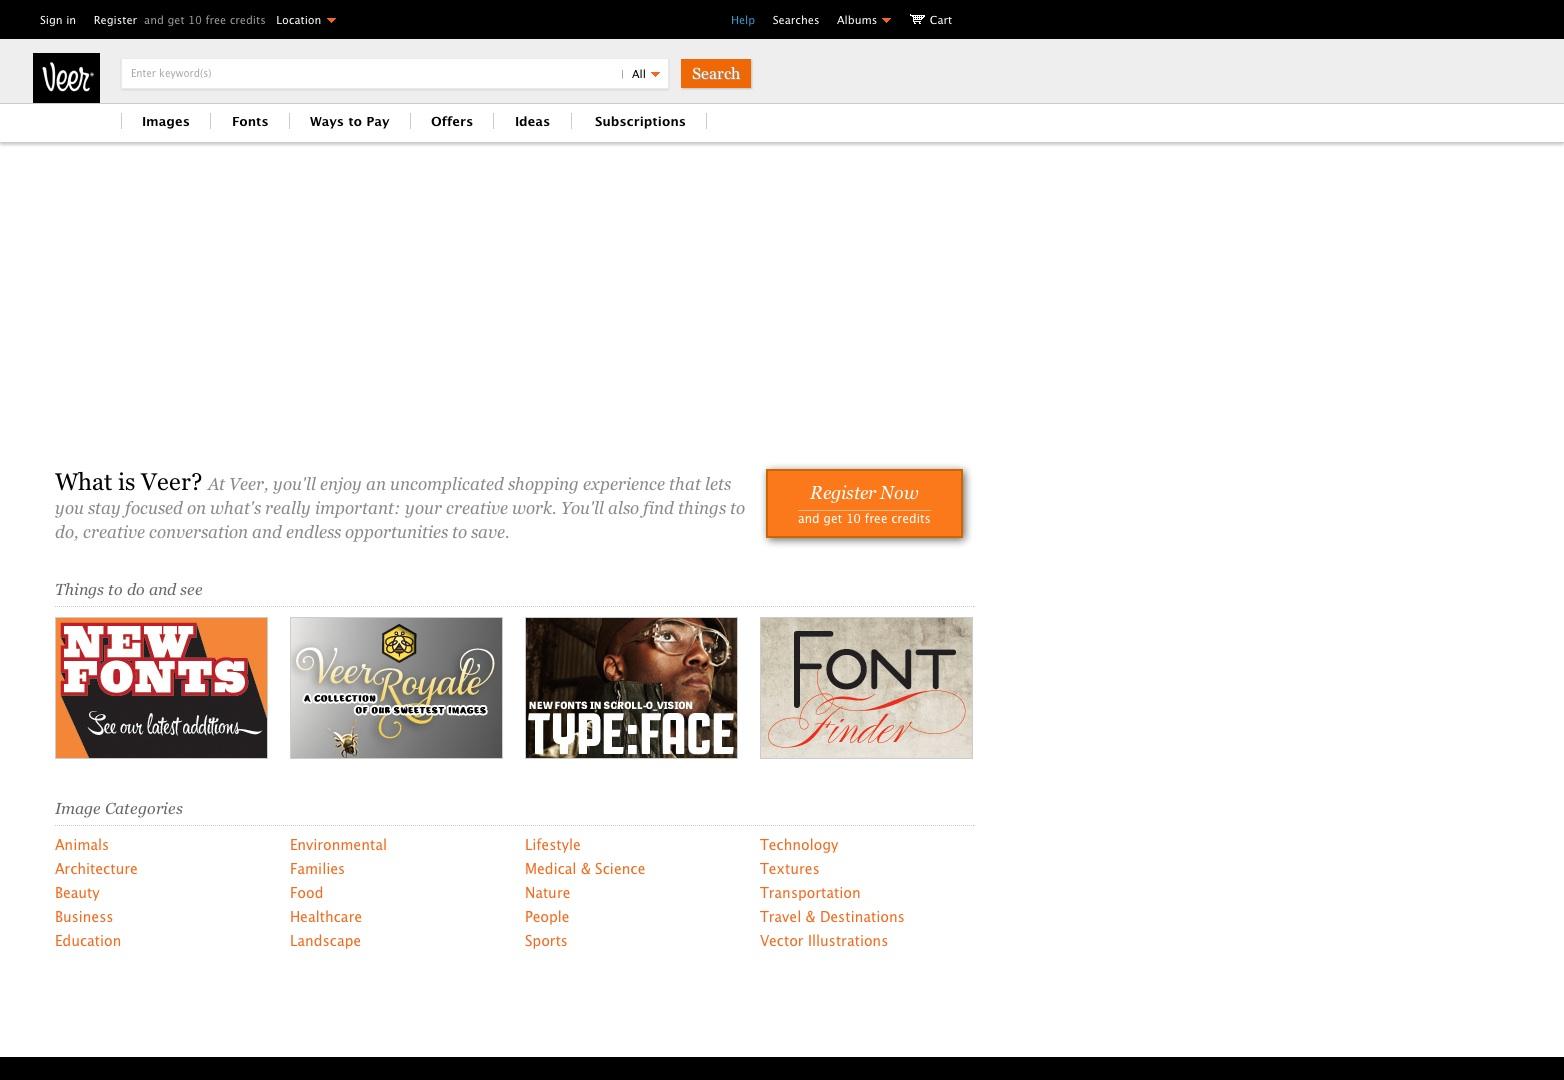 Stock-Photos-Stock-Illustration-Fonts-Veer.com.jpg